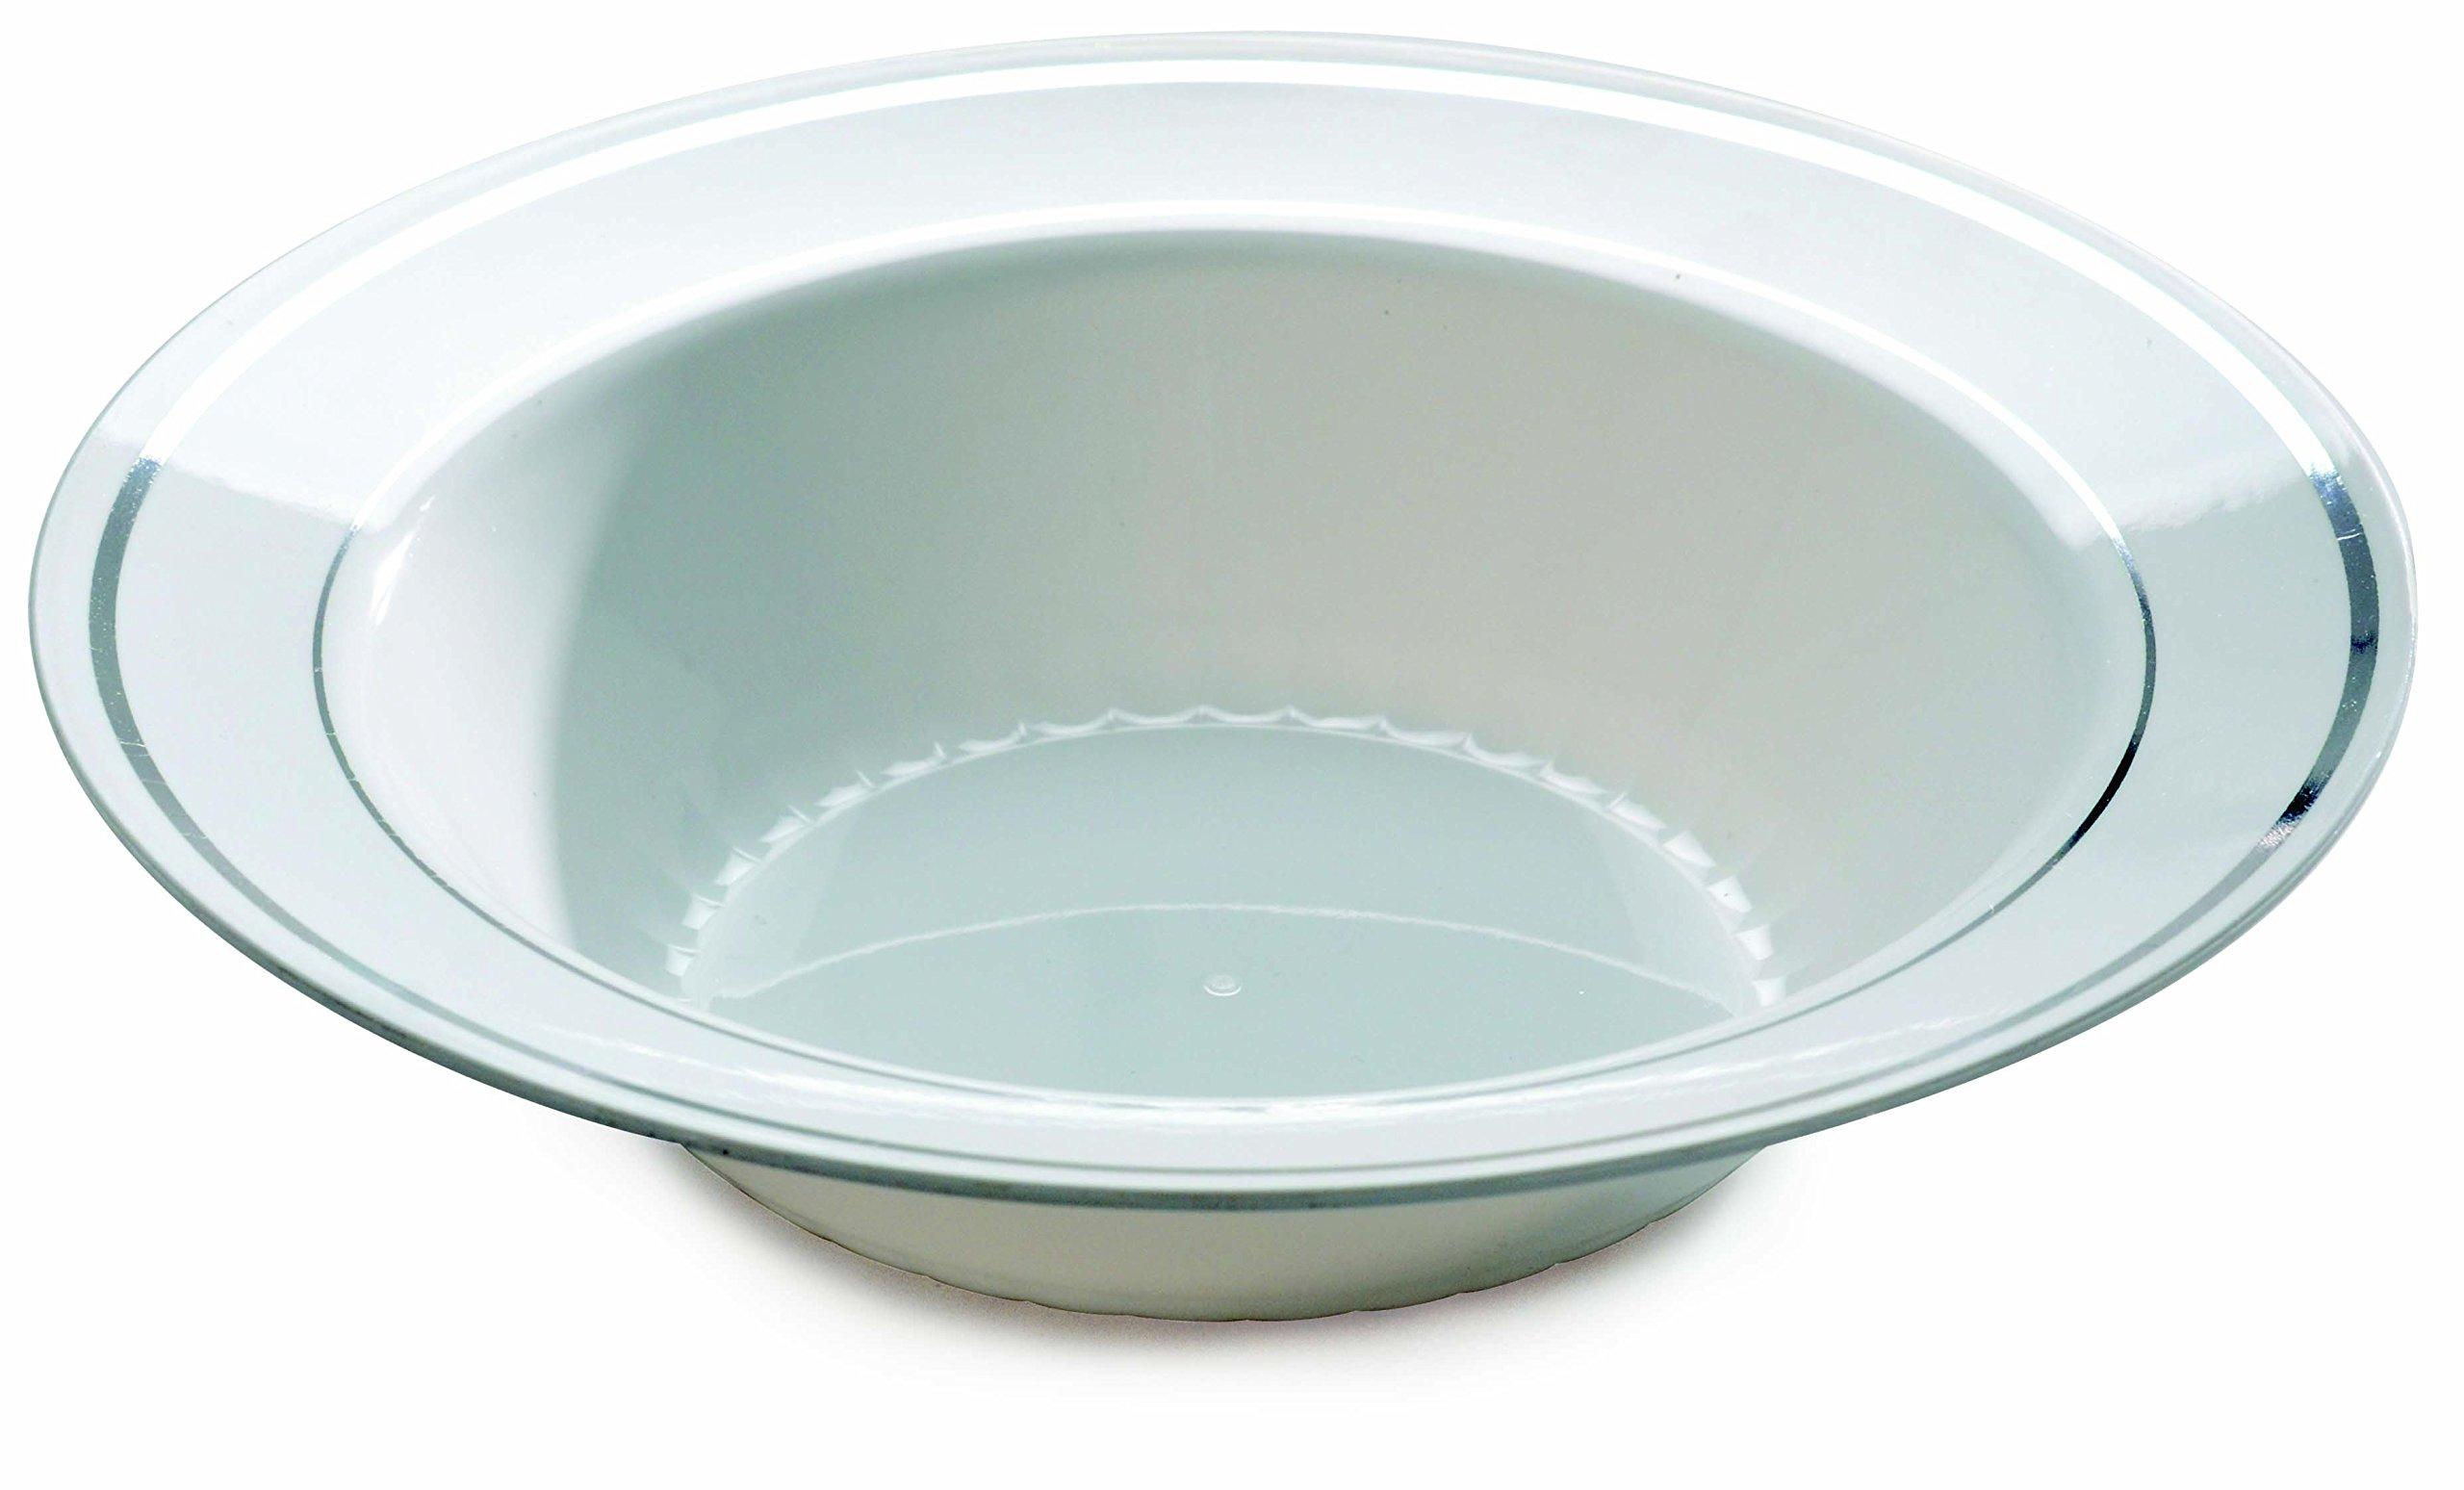 Fineline 12 oz Silver Splendor Bowl (Case of 150) (15 x 10), White